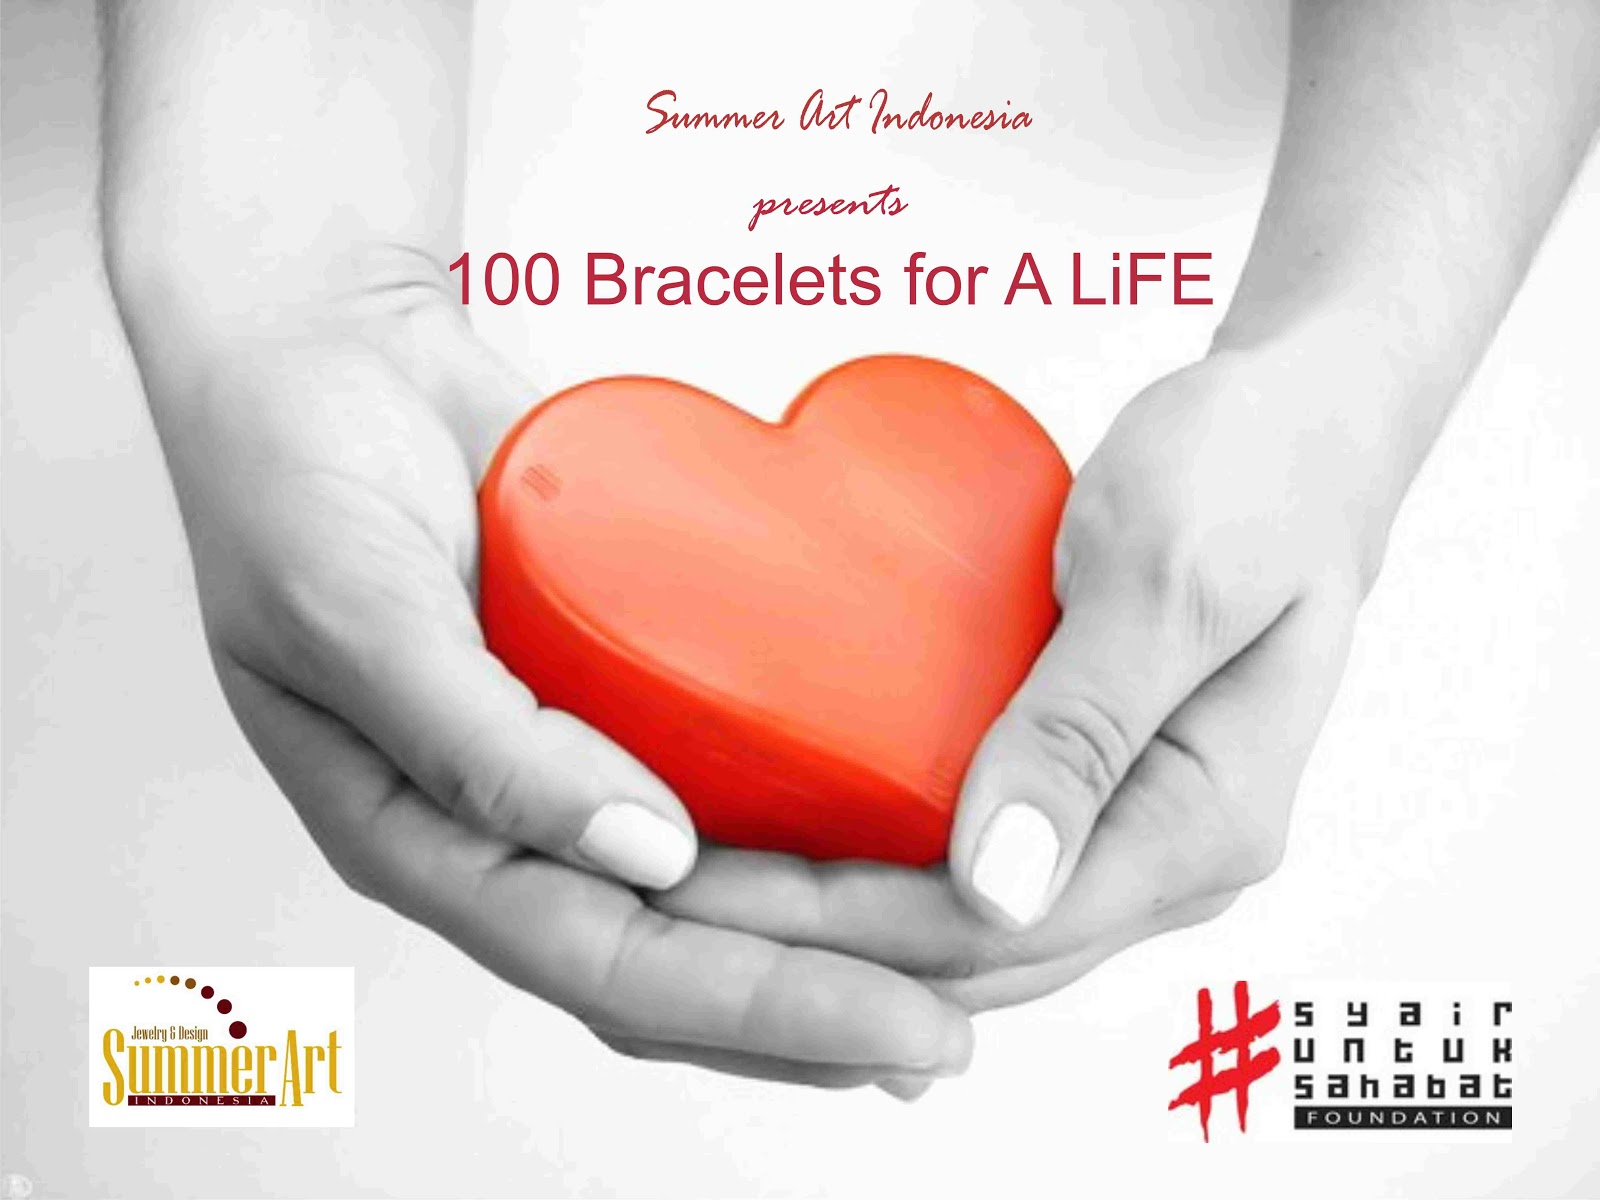 http://2.bp.blogspot.com/-RGJDmzUJZ8U/TnQbs2F_5AI/AAAAAAAAAXA/tPgz5hWeQaA/s1600/bracelet+for+a+life+2.jpg